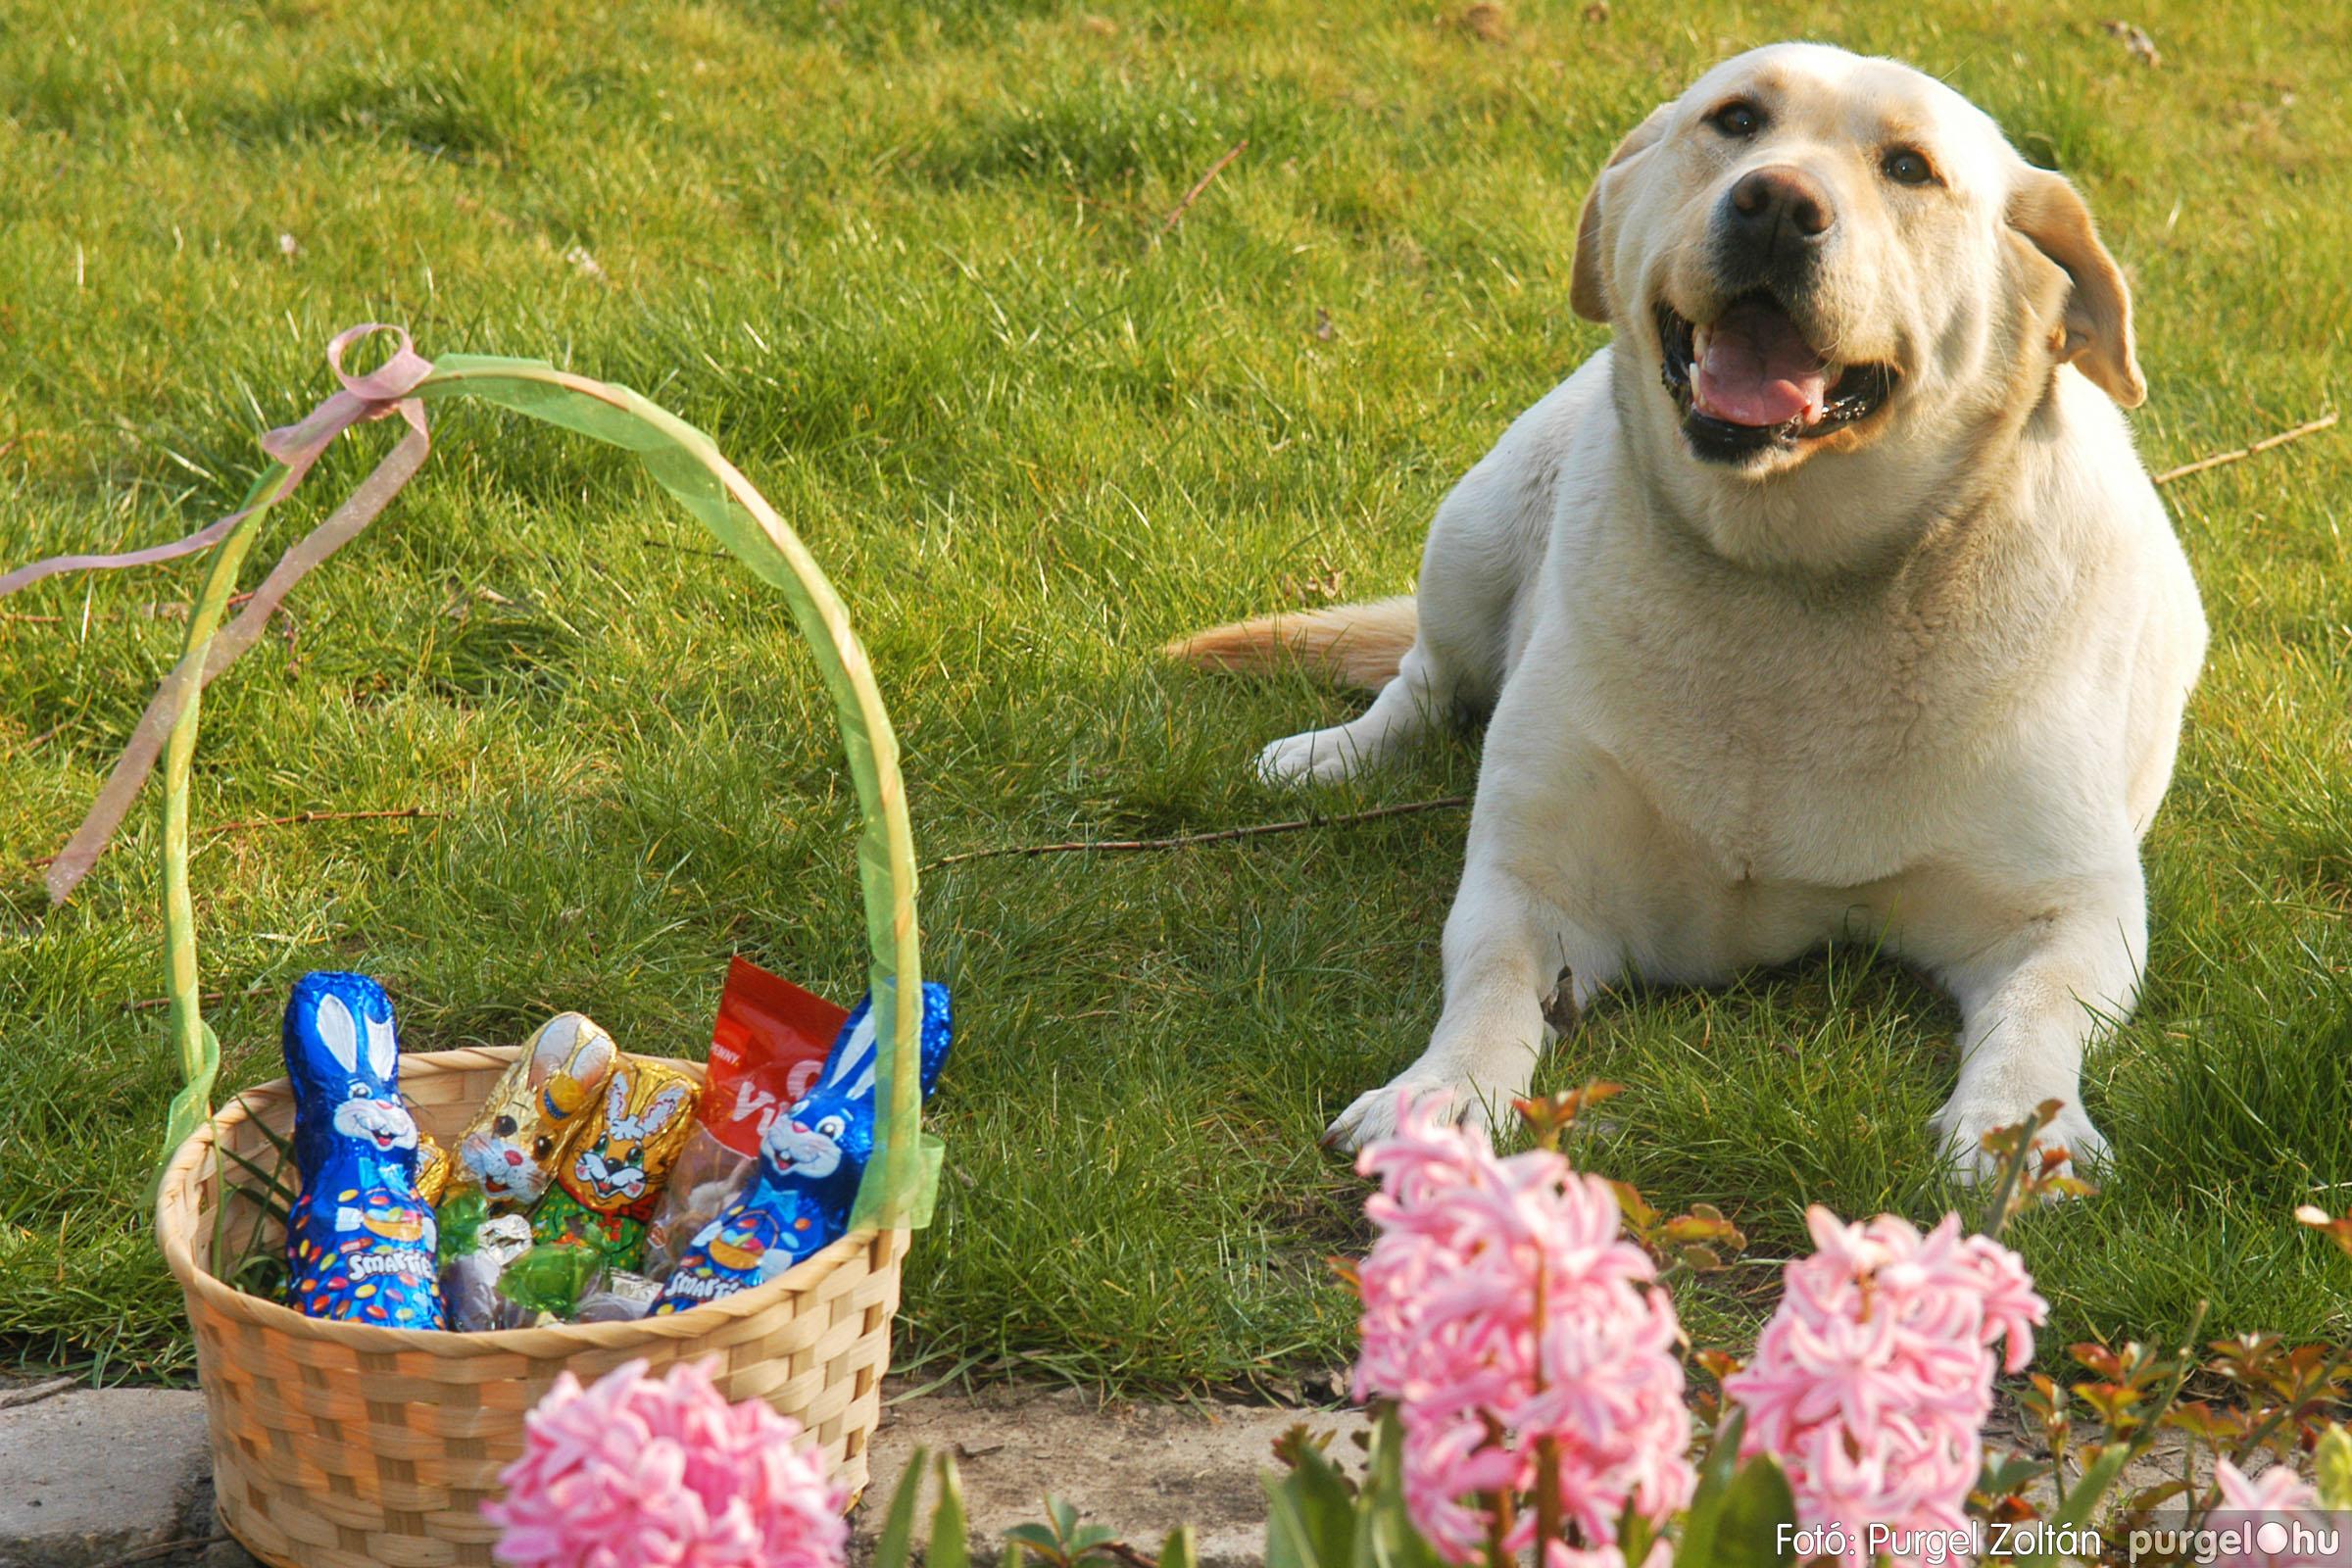 Kijárási tilalom kutyáknak